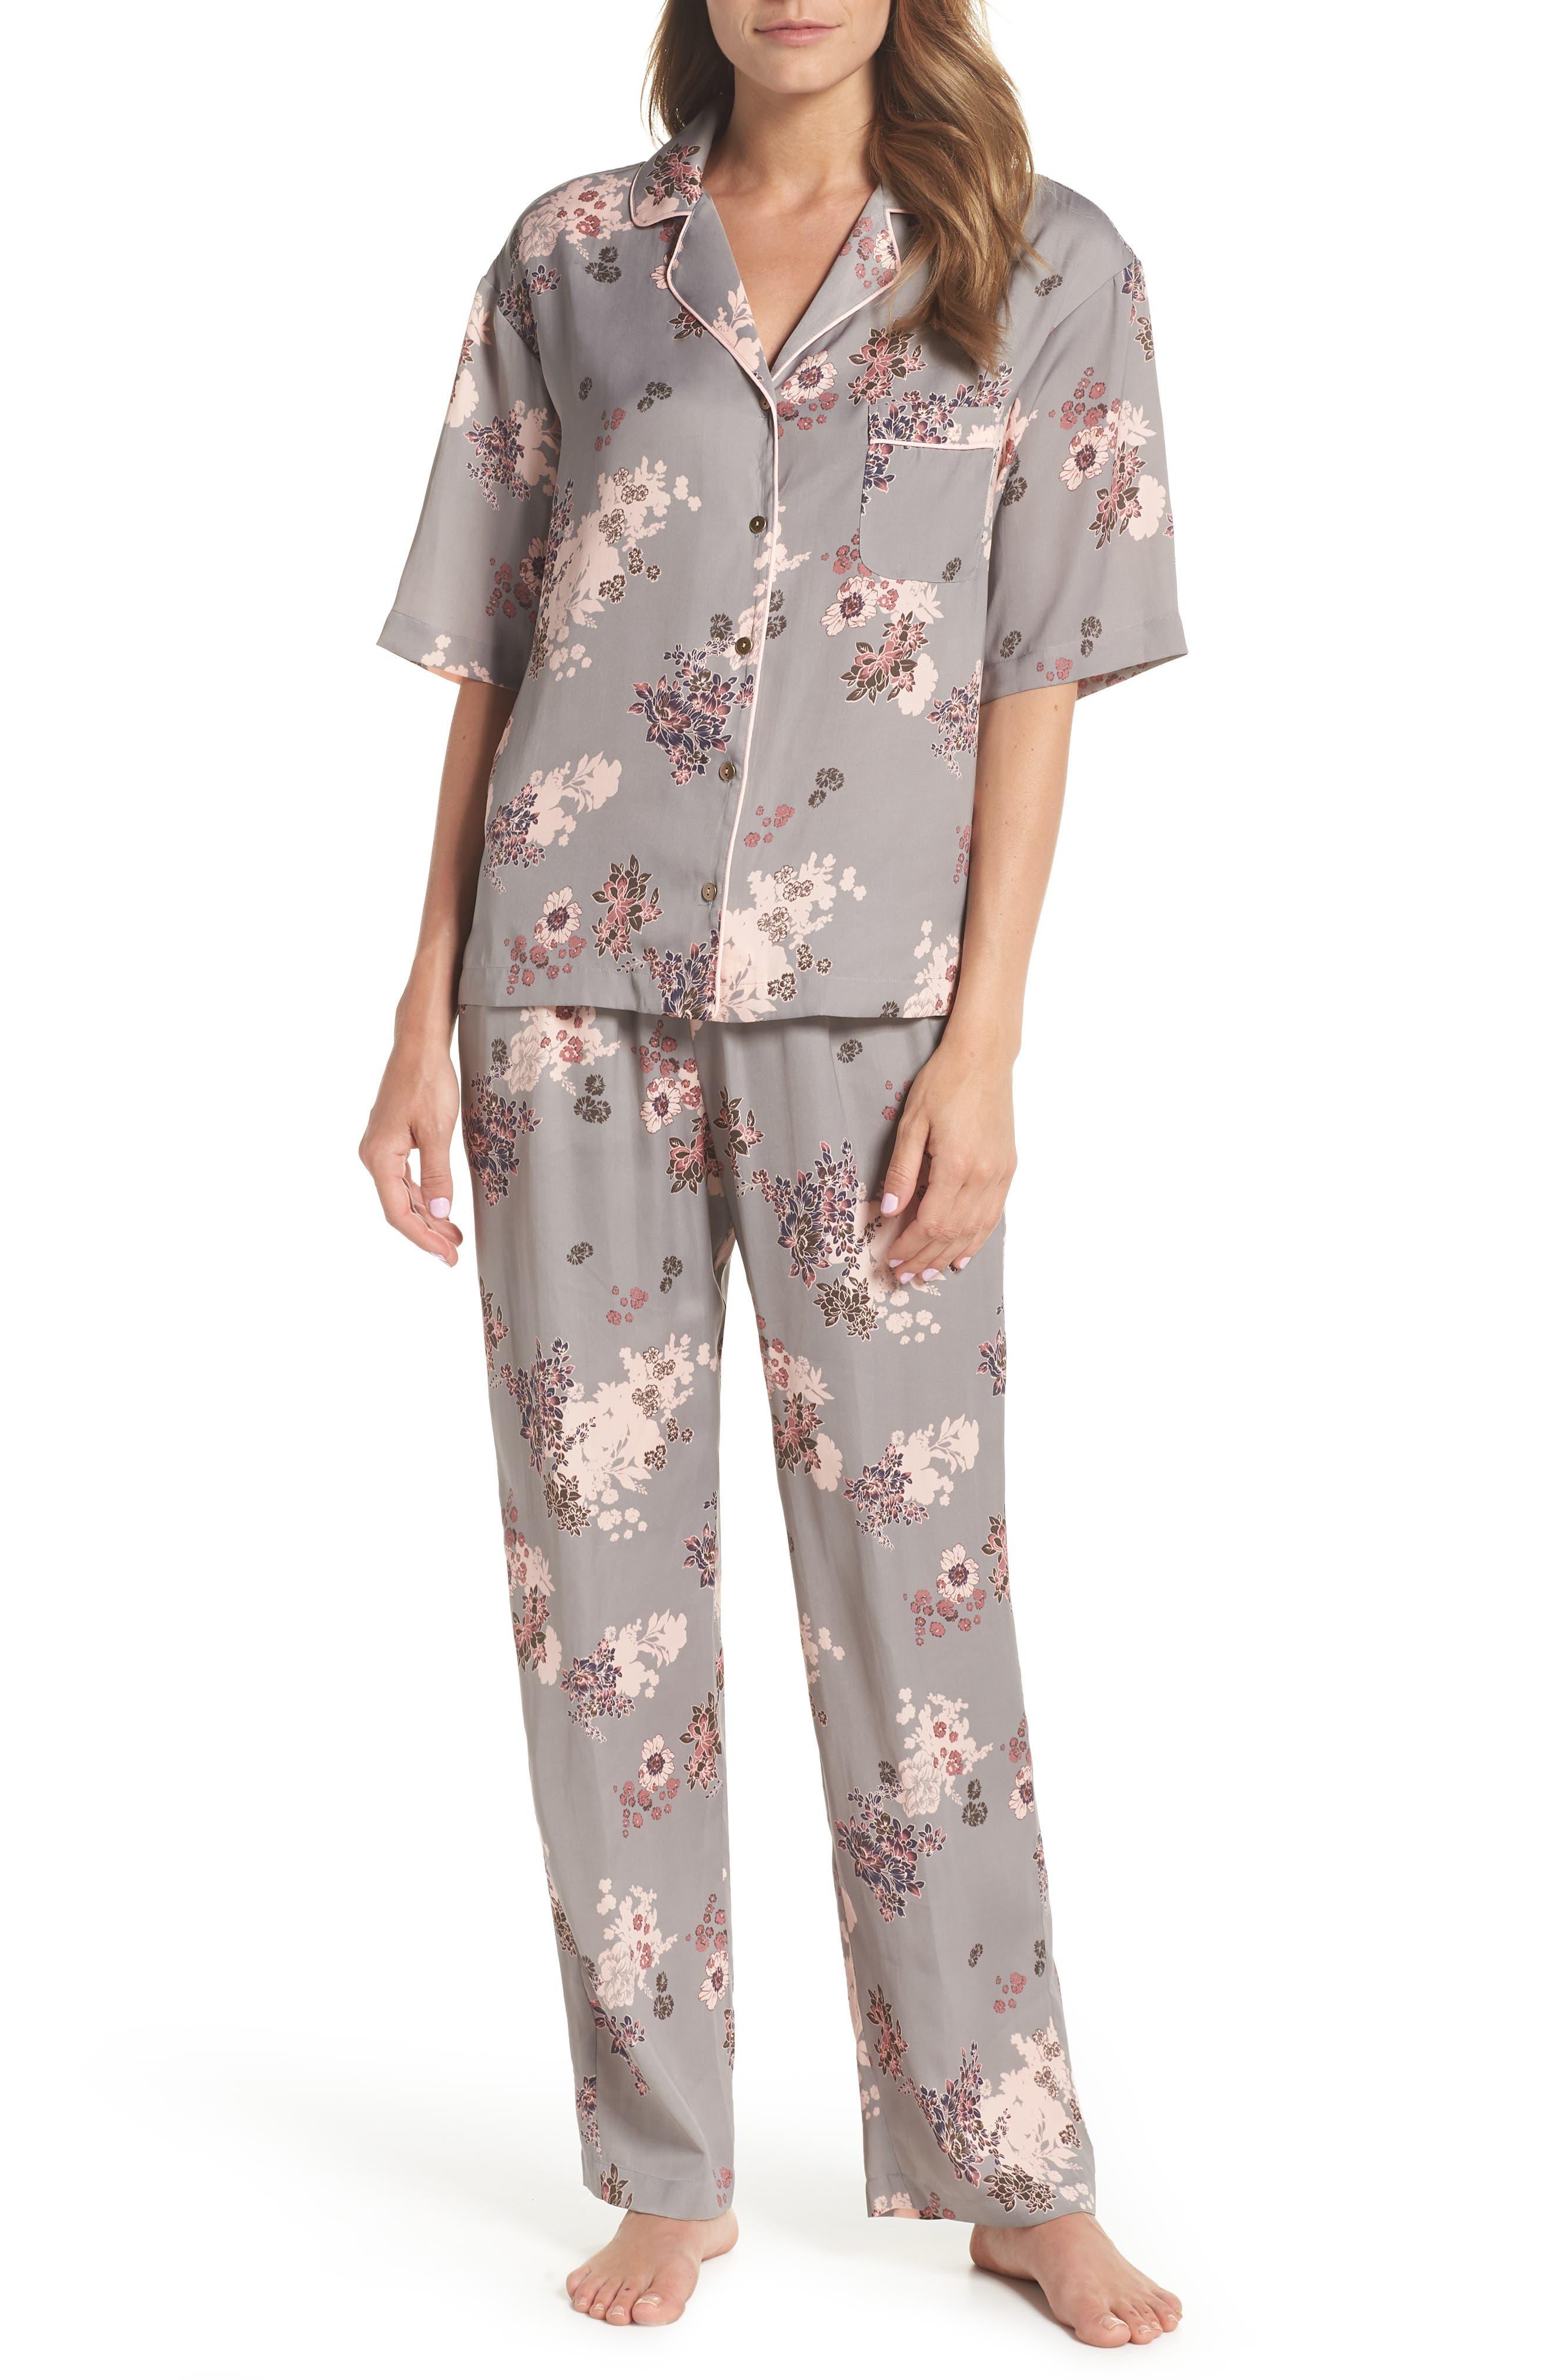 NORDSTROM LINGERIE,                             Matte Satin Pajamas,                             Main thumbnail 1, color,                             030